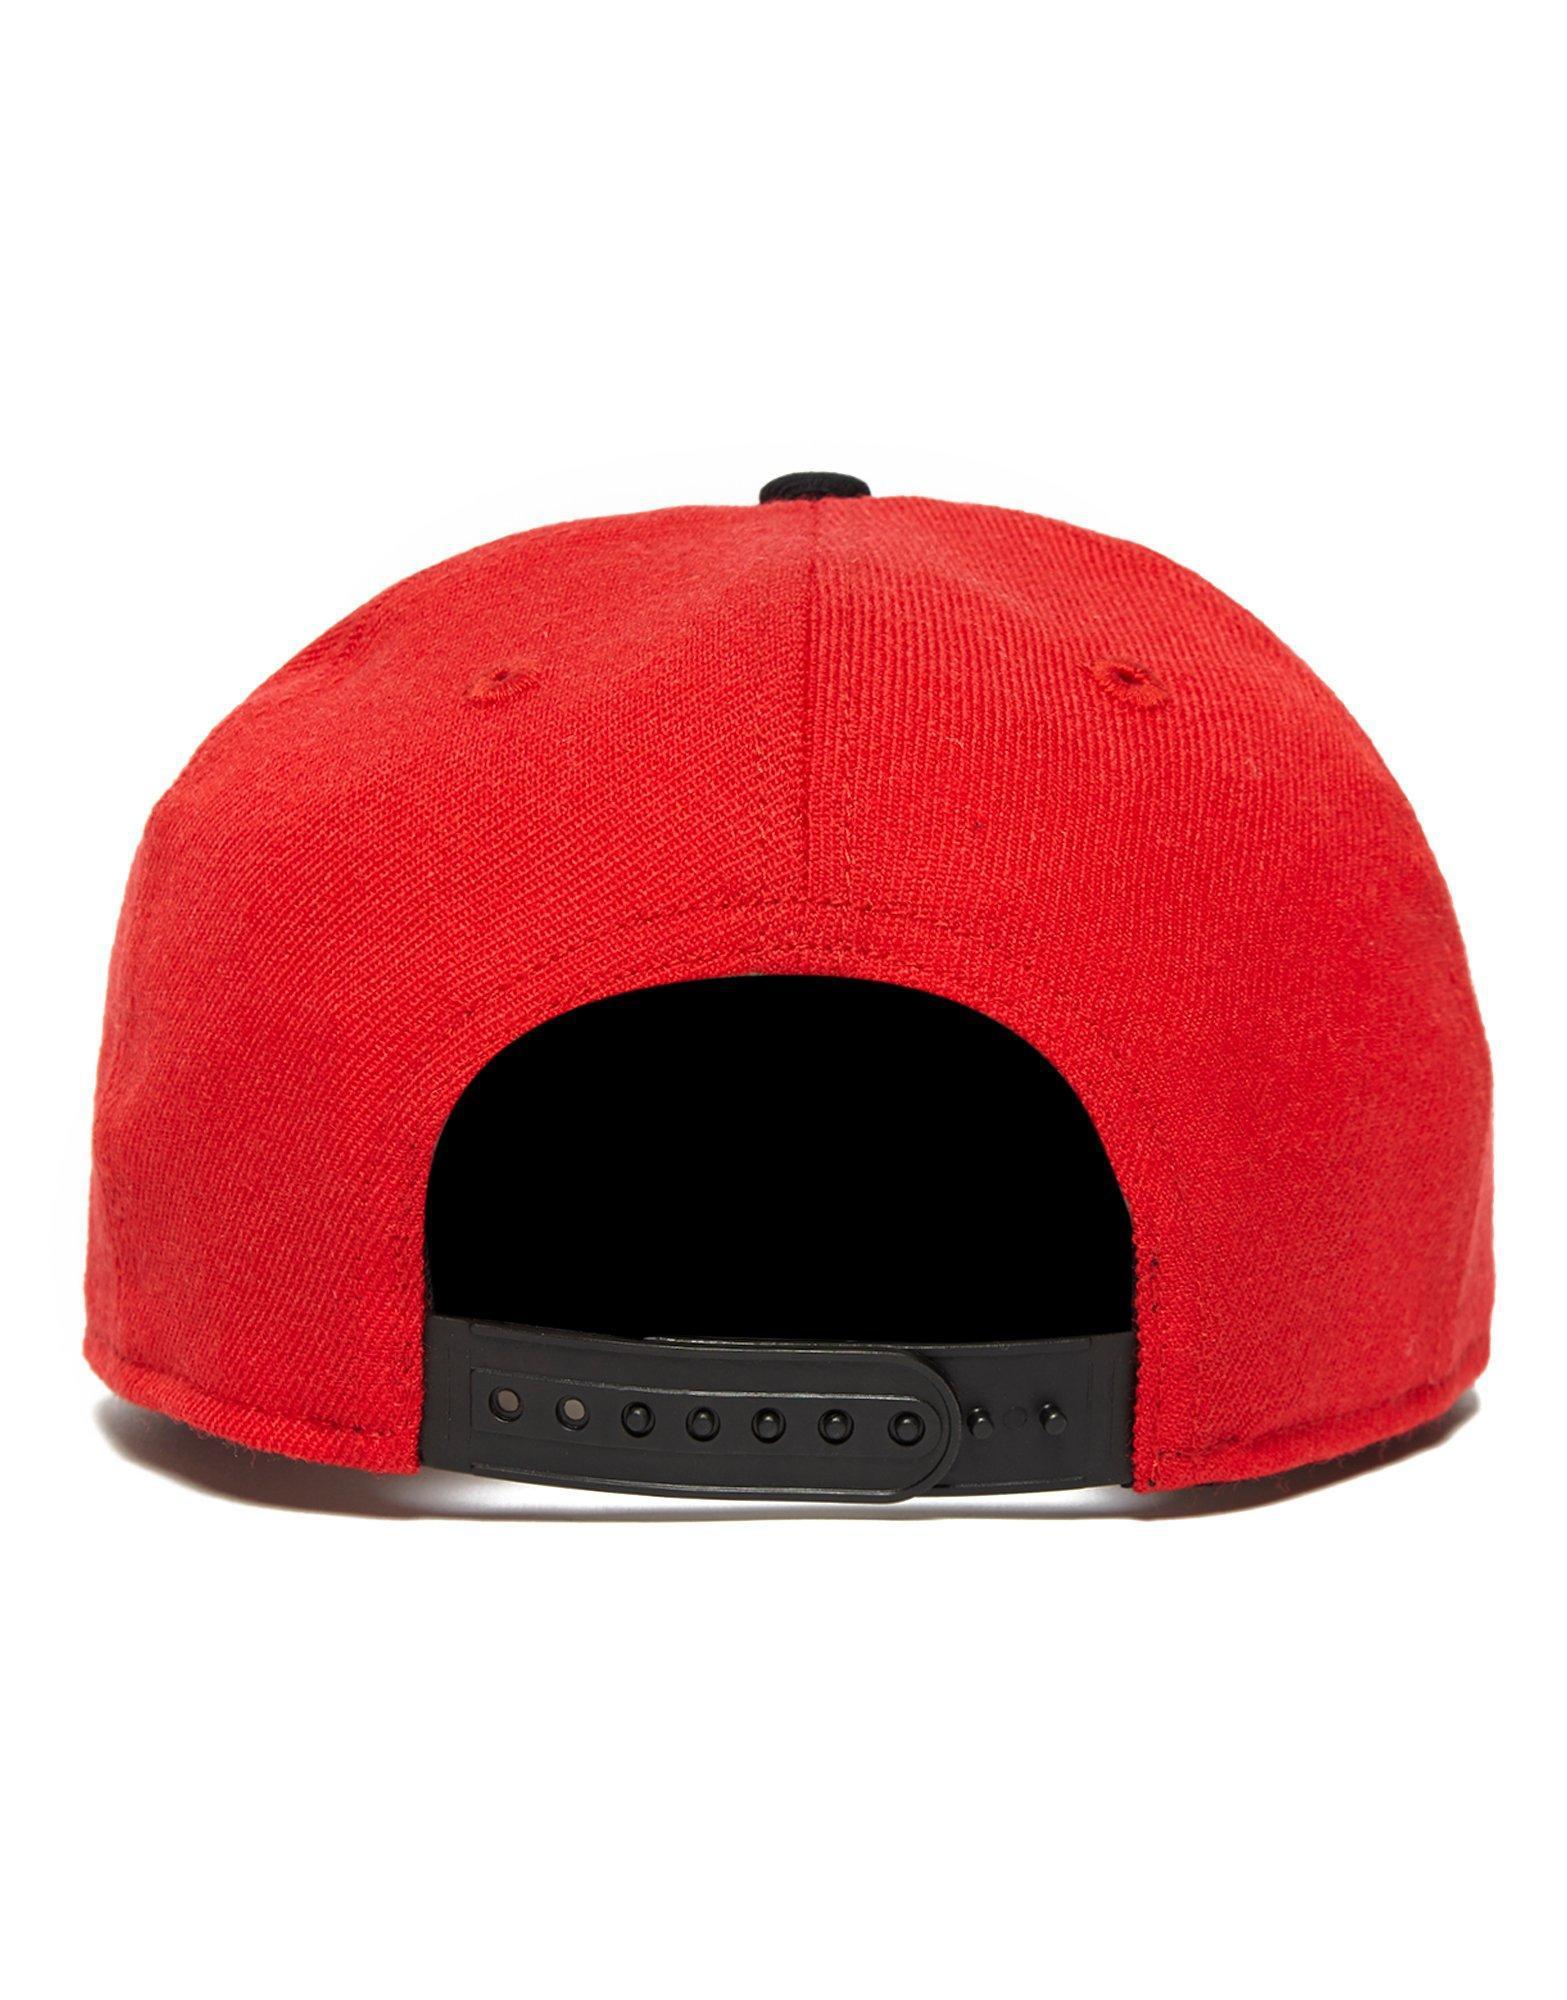 fdfc7e23761 Nike Futura True 2 Snapback Cap in Red for Men - Lyst